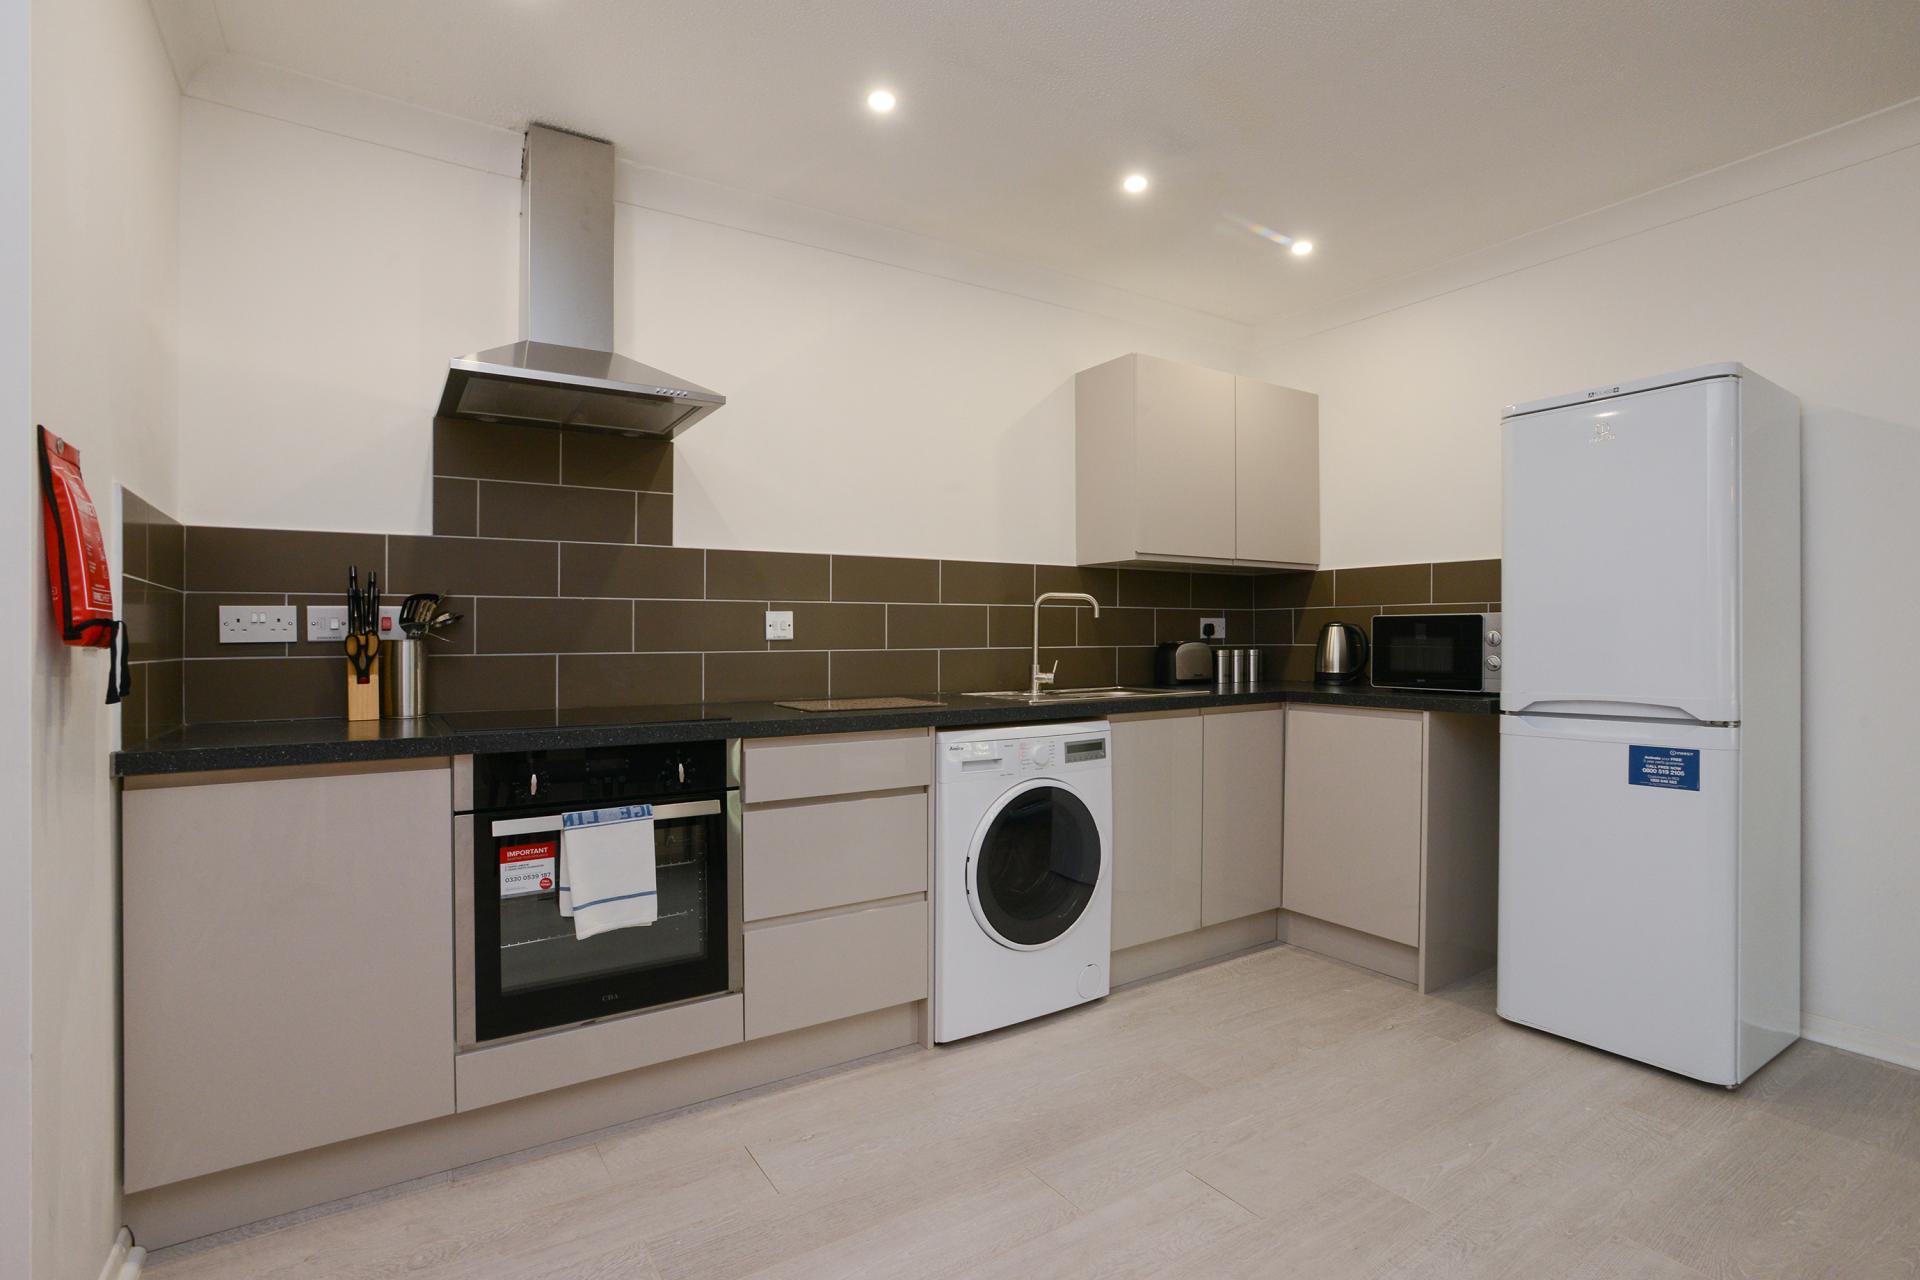 Kitchen at Brook Court Apartment, Radford, Nottingham - Citybase Apartments